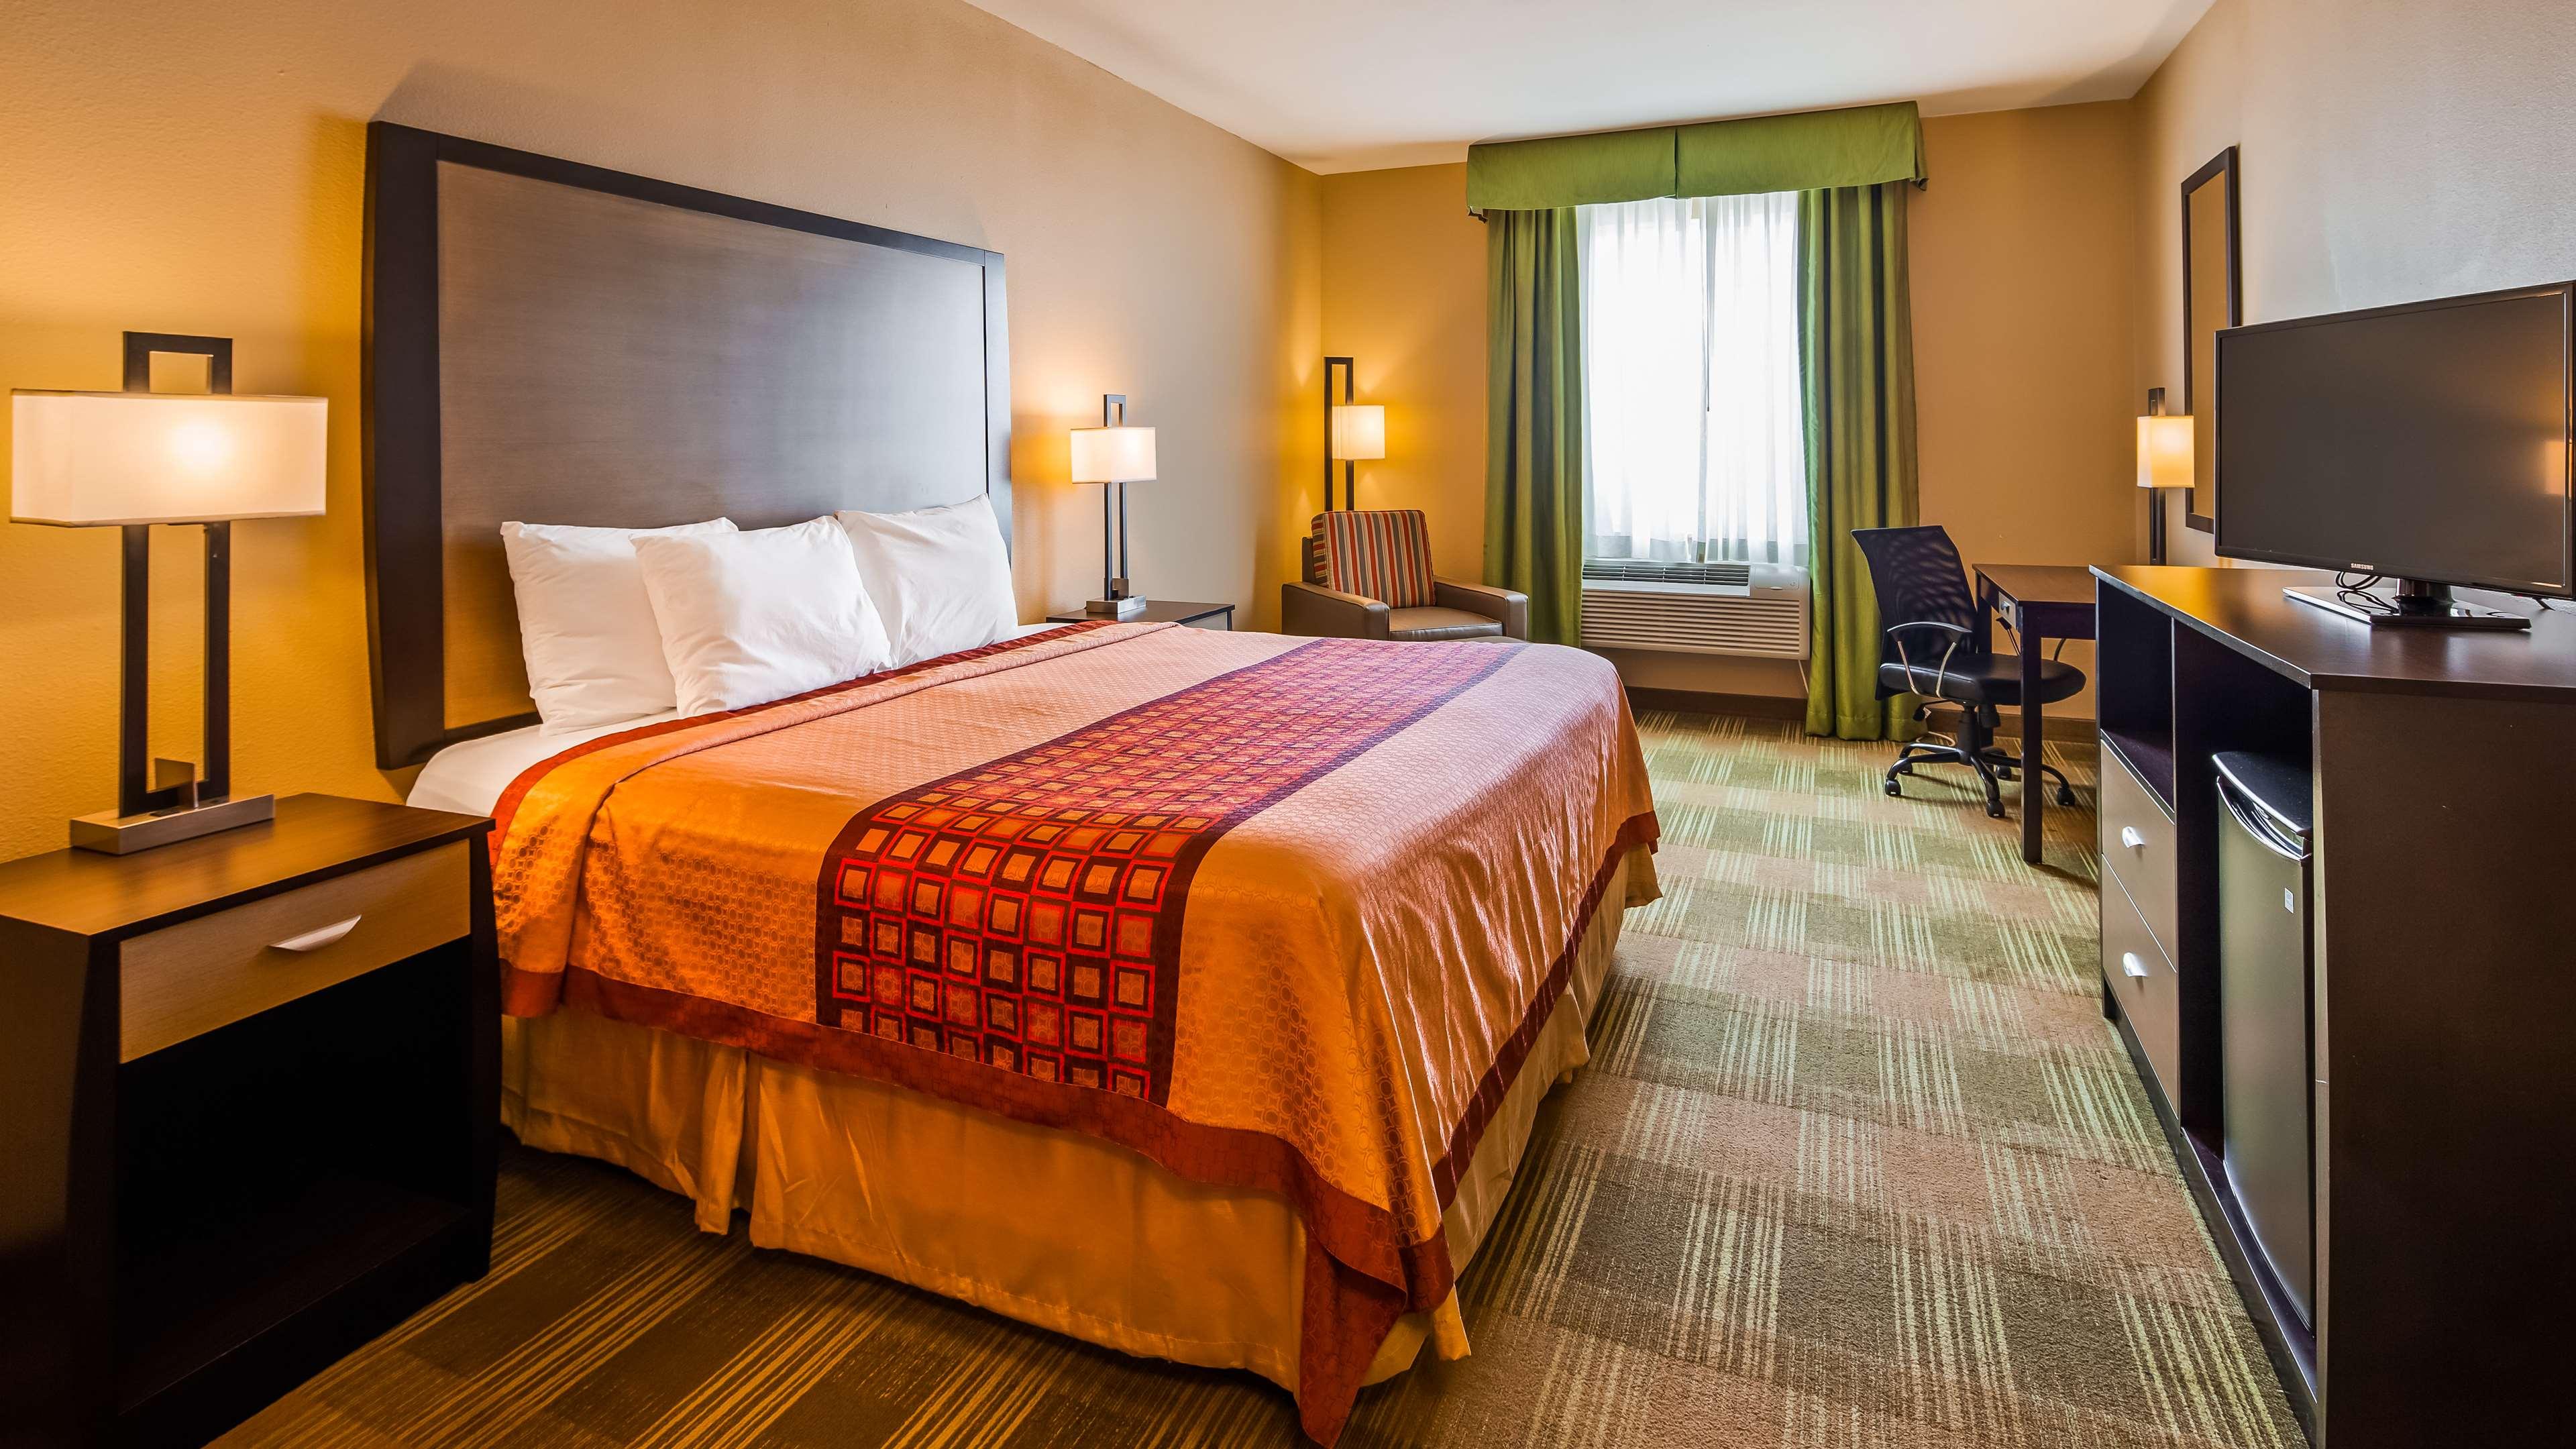 SureStay Hotel by Best Western Cotulla image 11